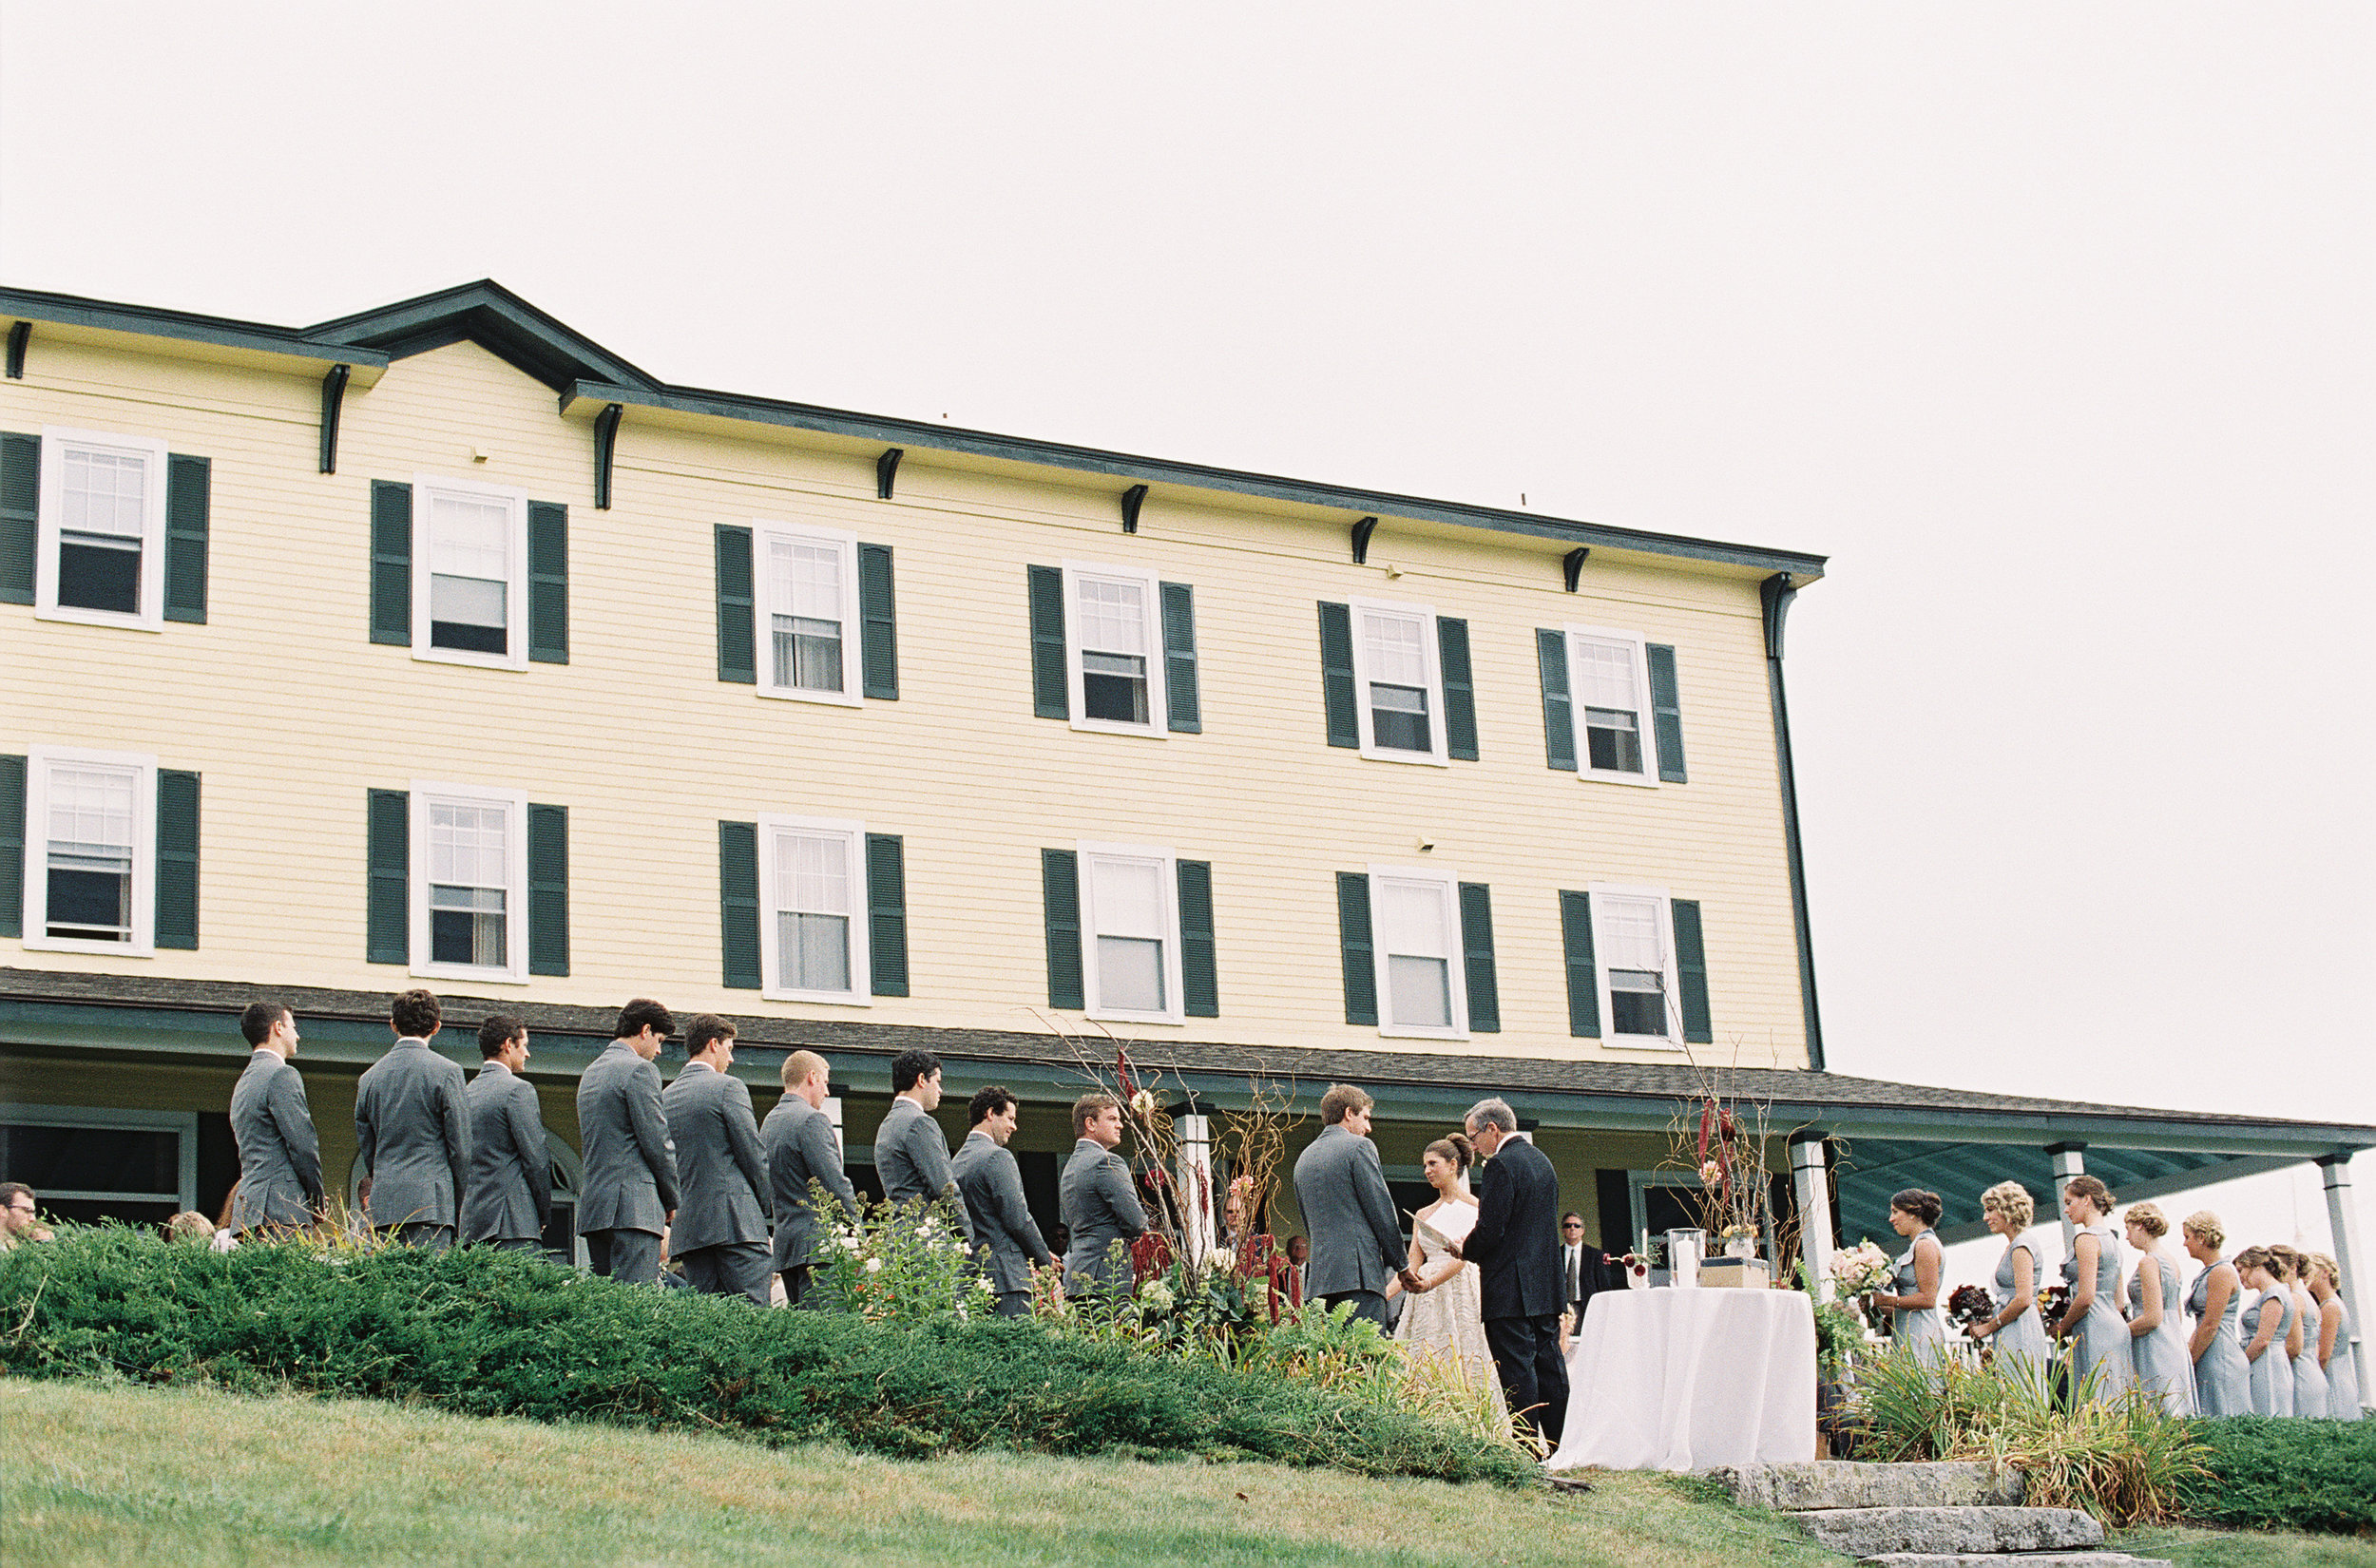 chebeague_island_inn_wedding_gabe_aceves011.JPG